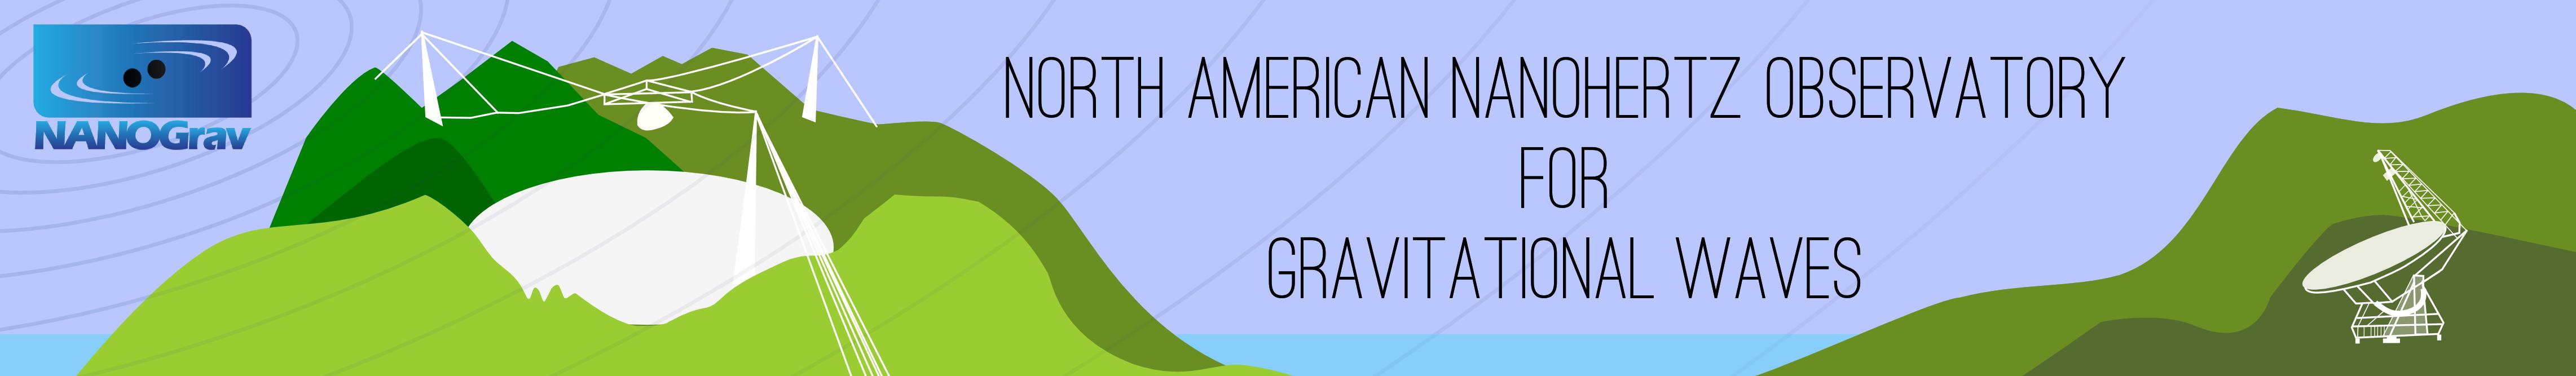 NANOGrav_gravity5